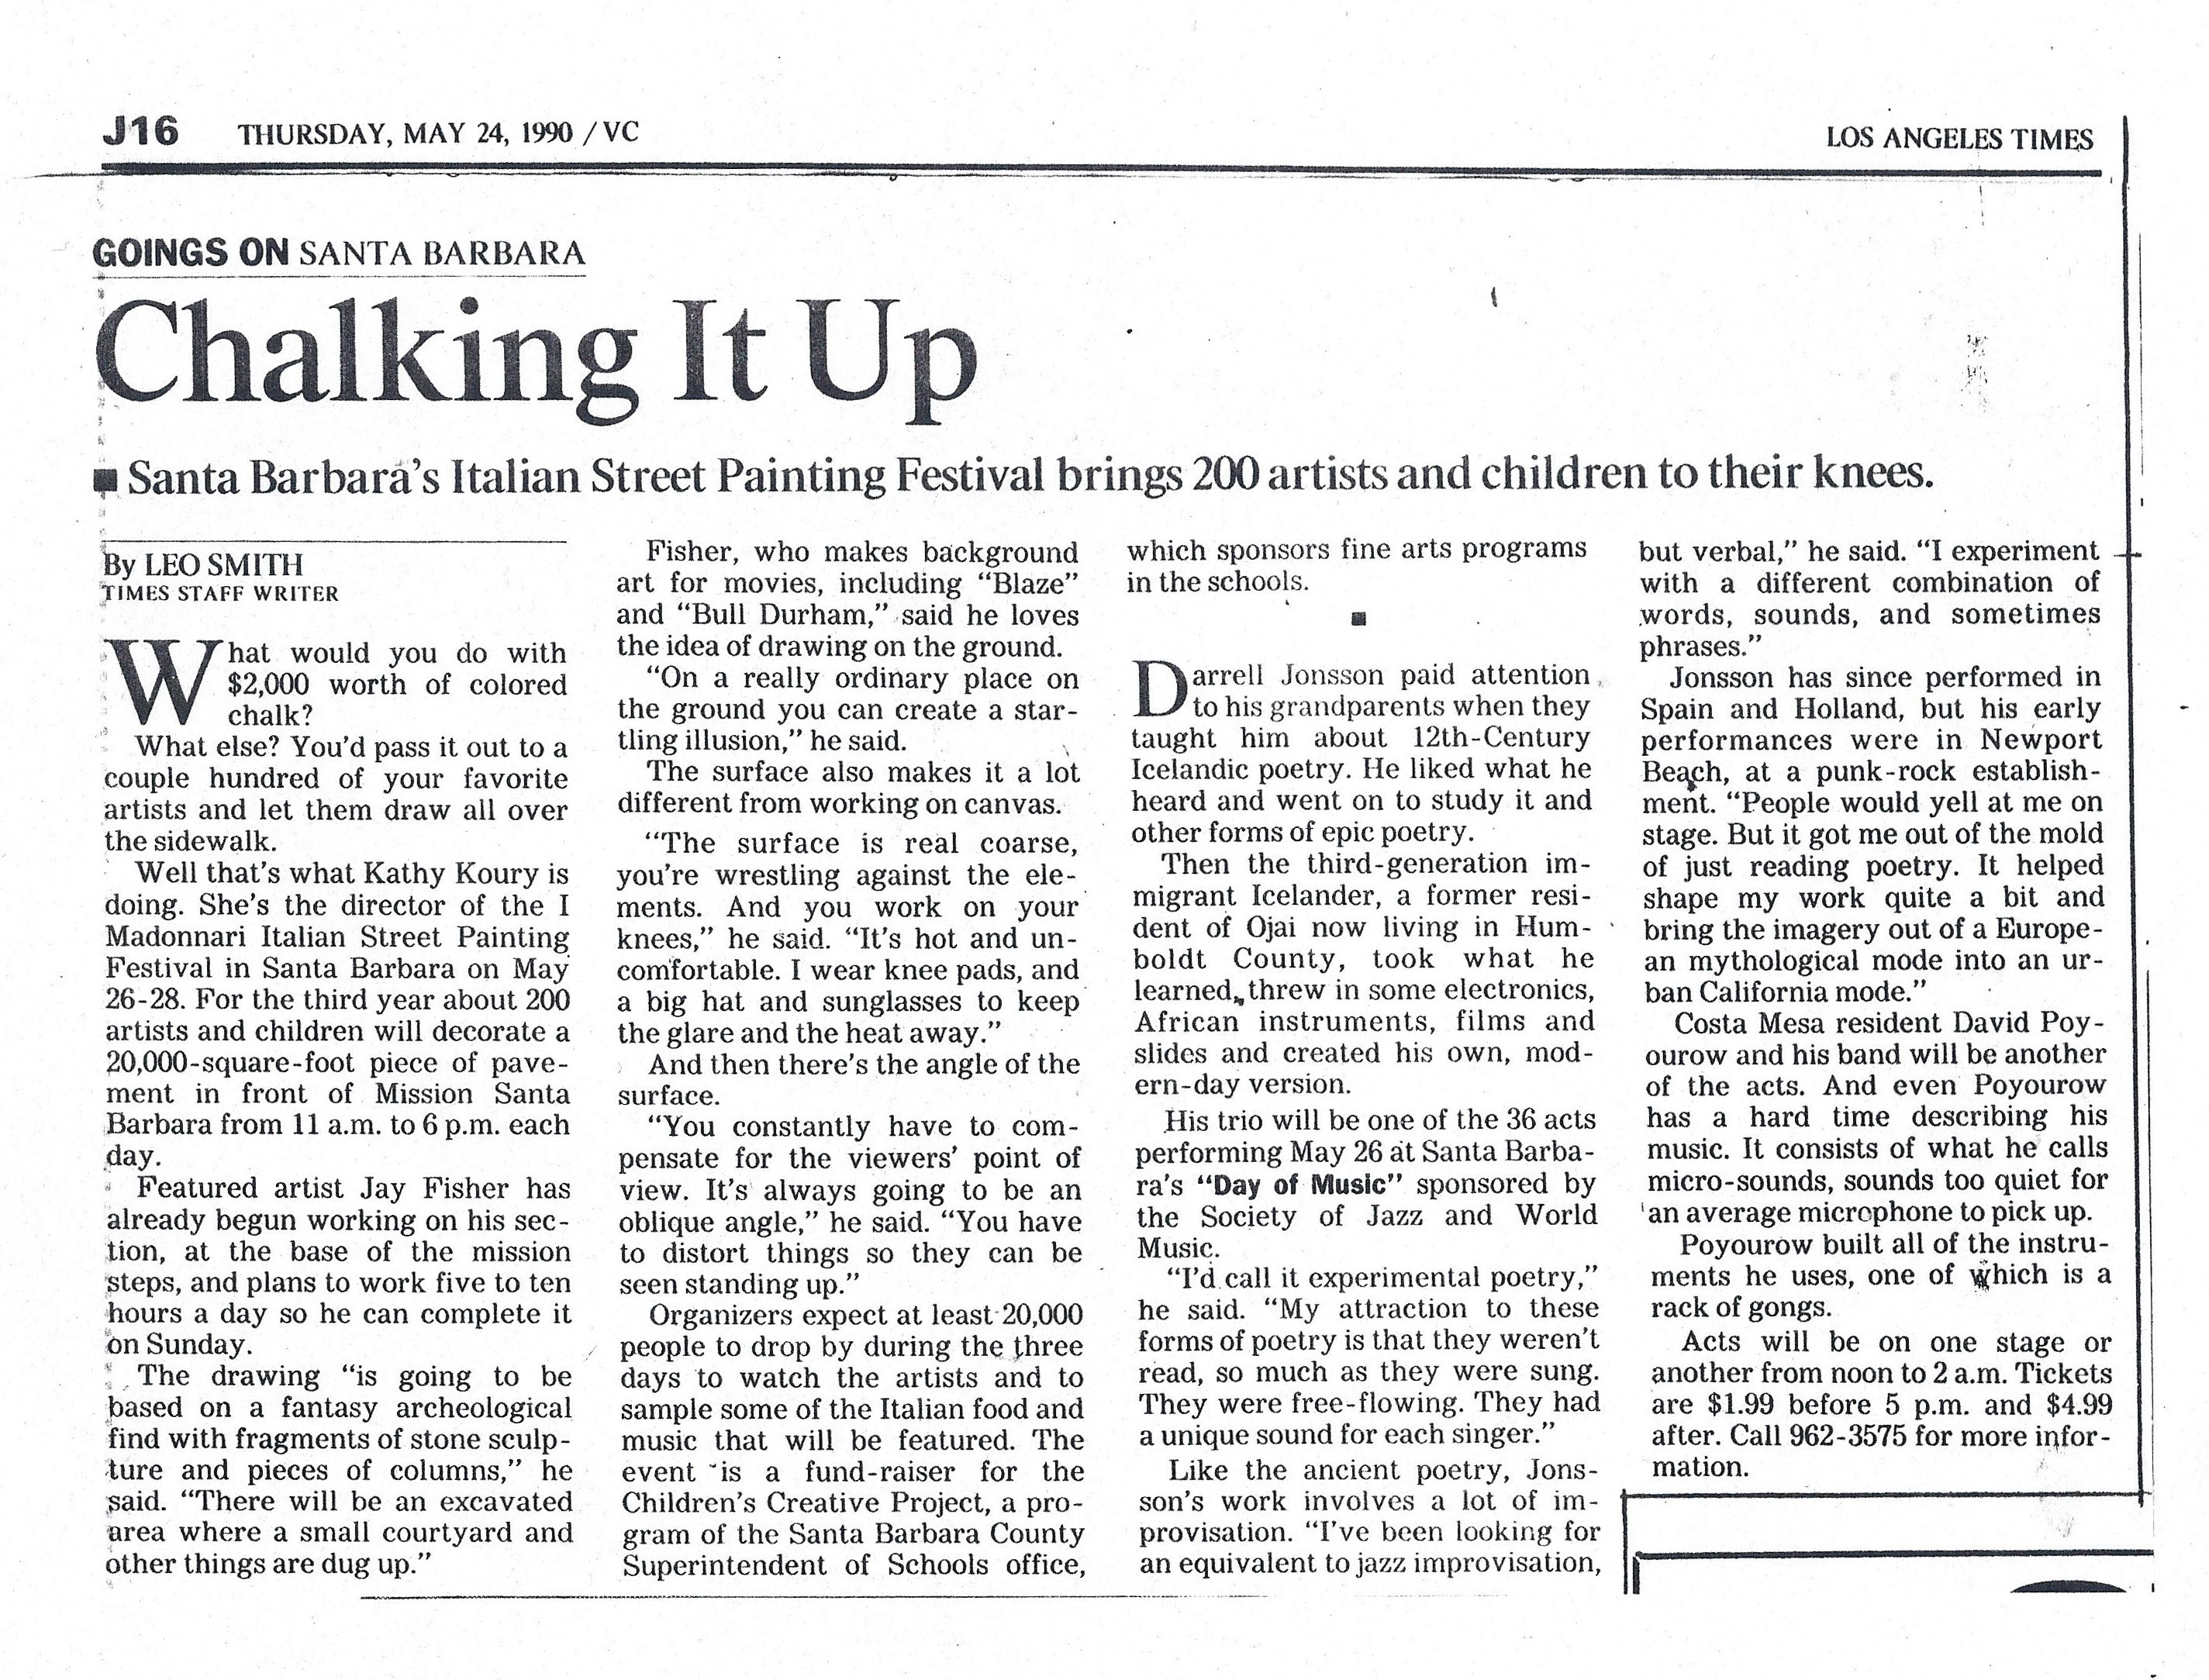 2kwidechalking-it-up-1990-front